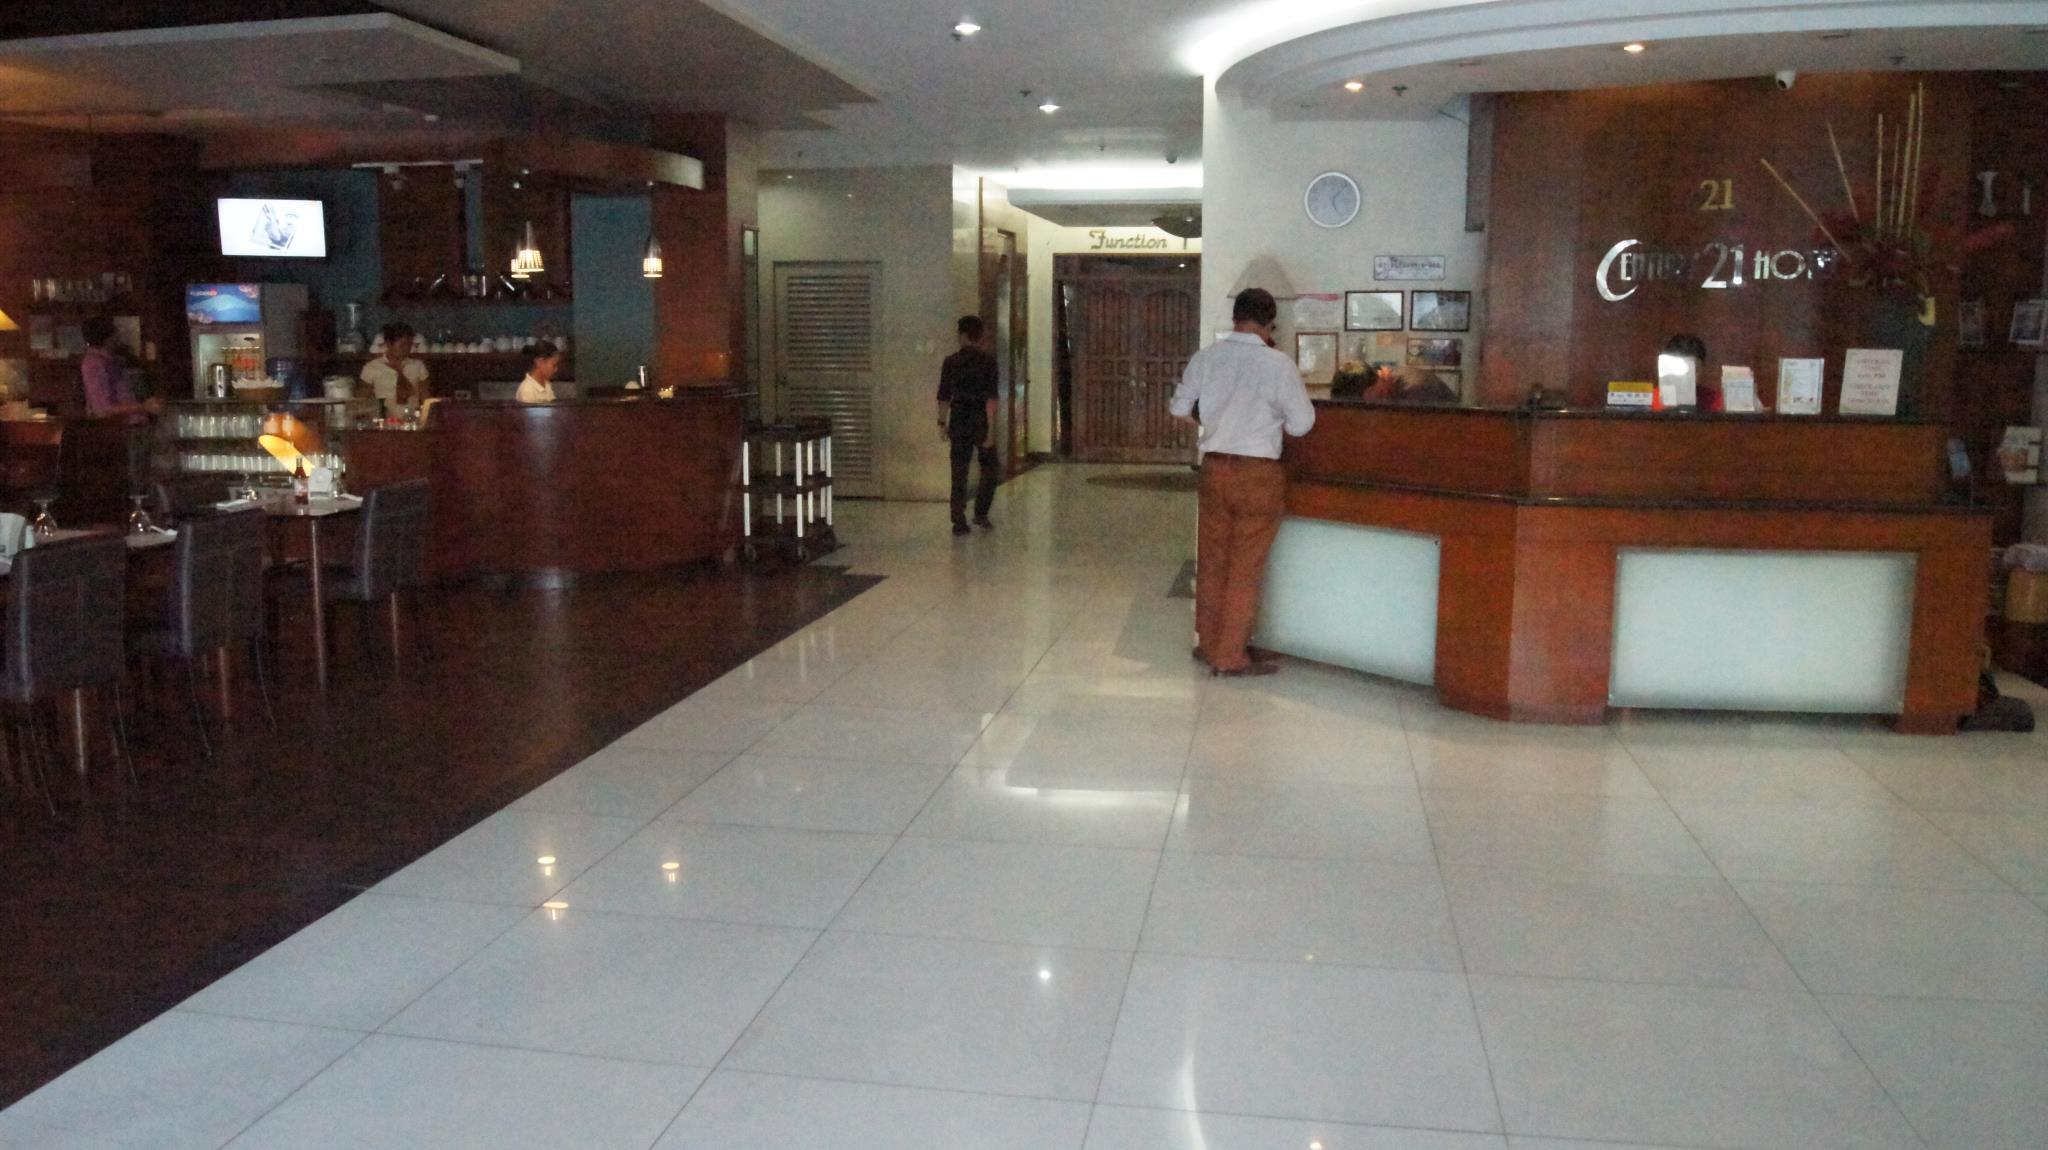 Century 21 Hotel ILOILO